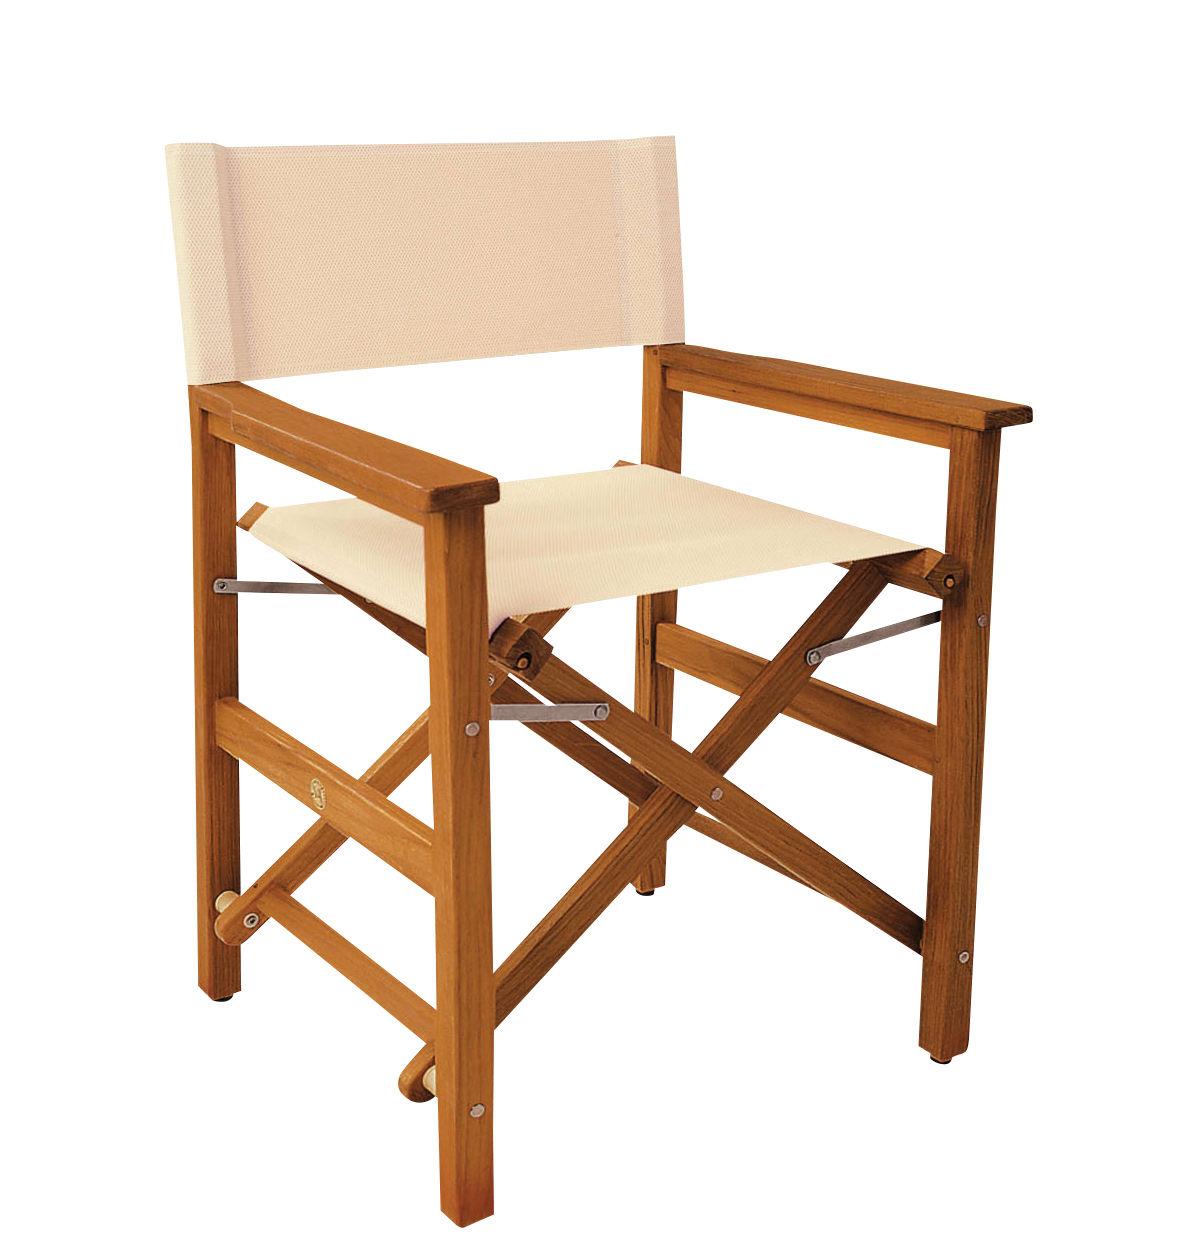 Decoration - Home Accessories - Deauville Pliable armchair - / Teak & canvas by Vlaemynck - Teak / White canvas - Batyline cloth, Oiled teak